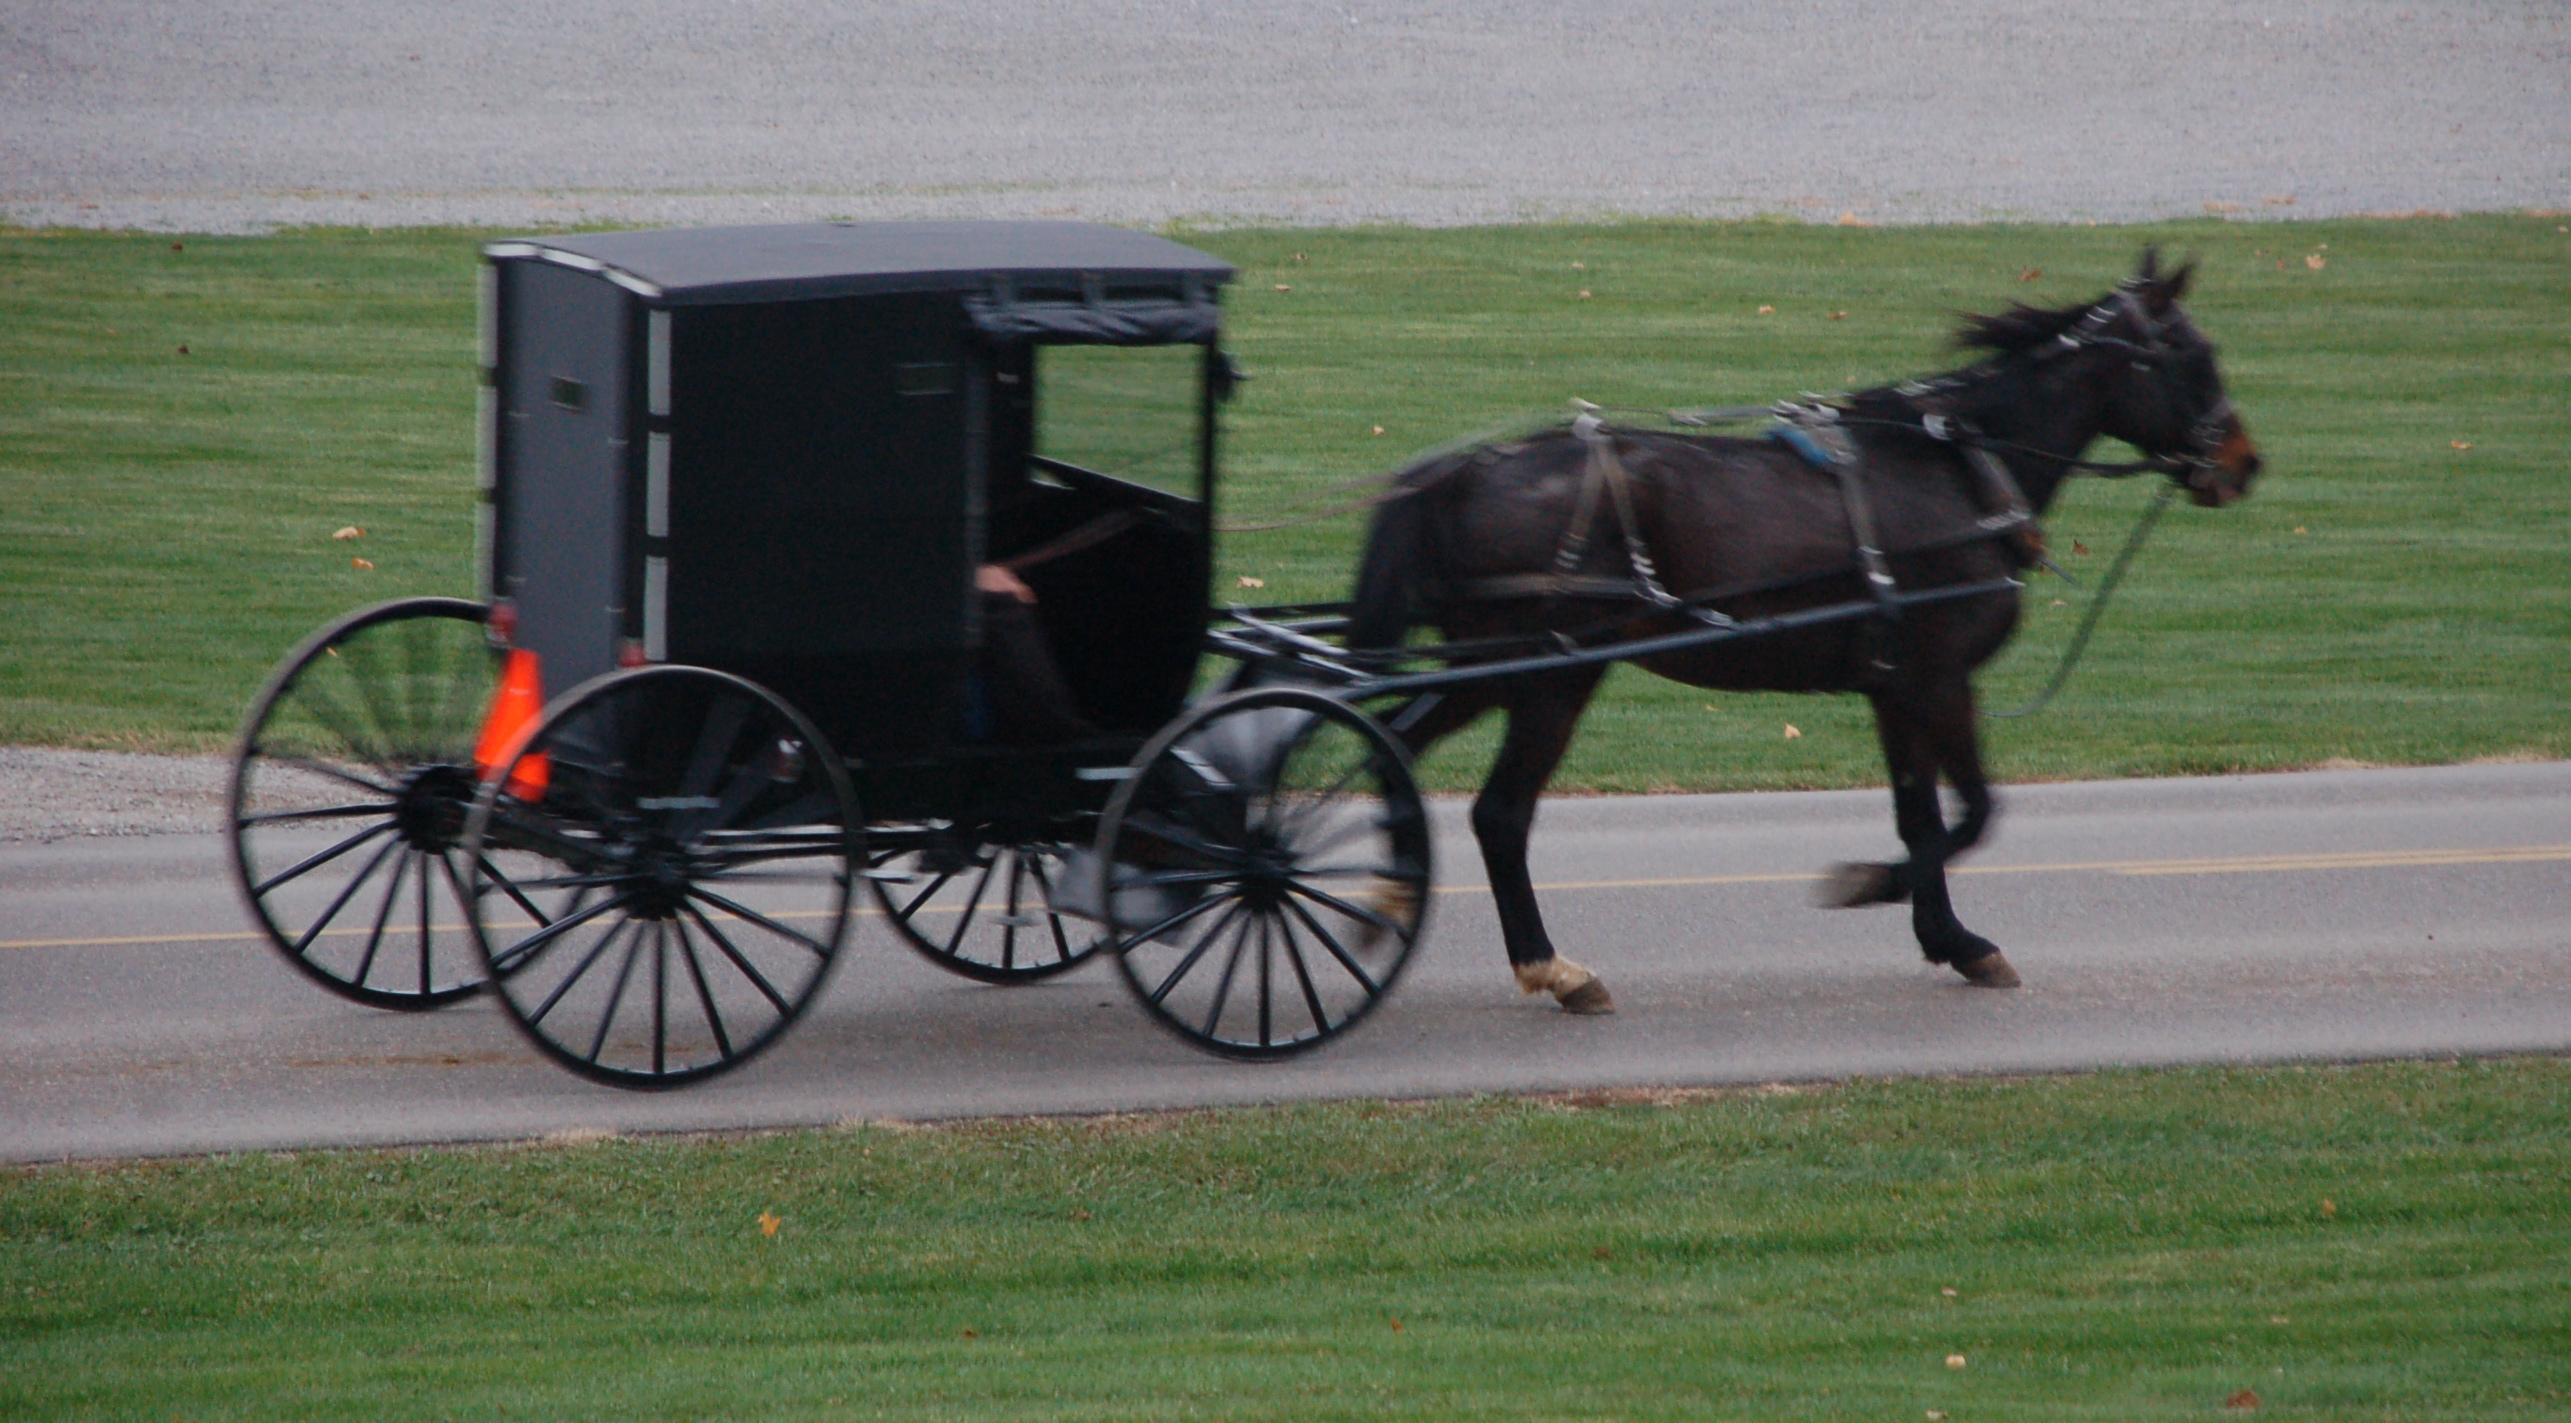 Amish cart photo